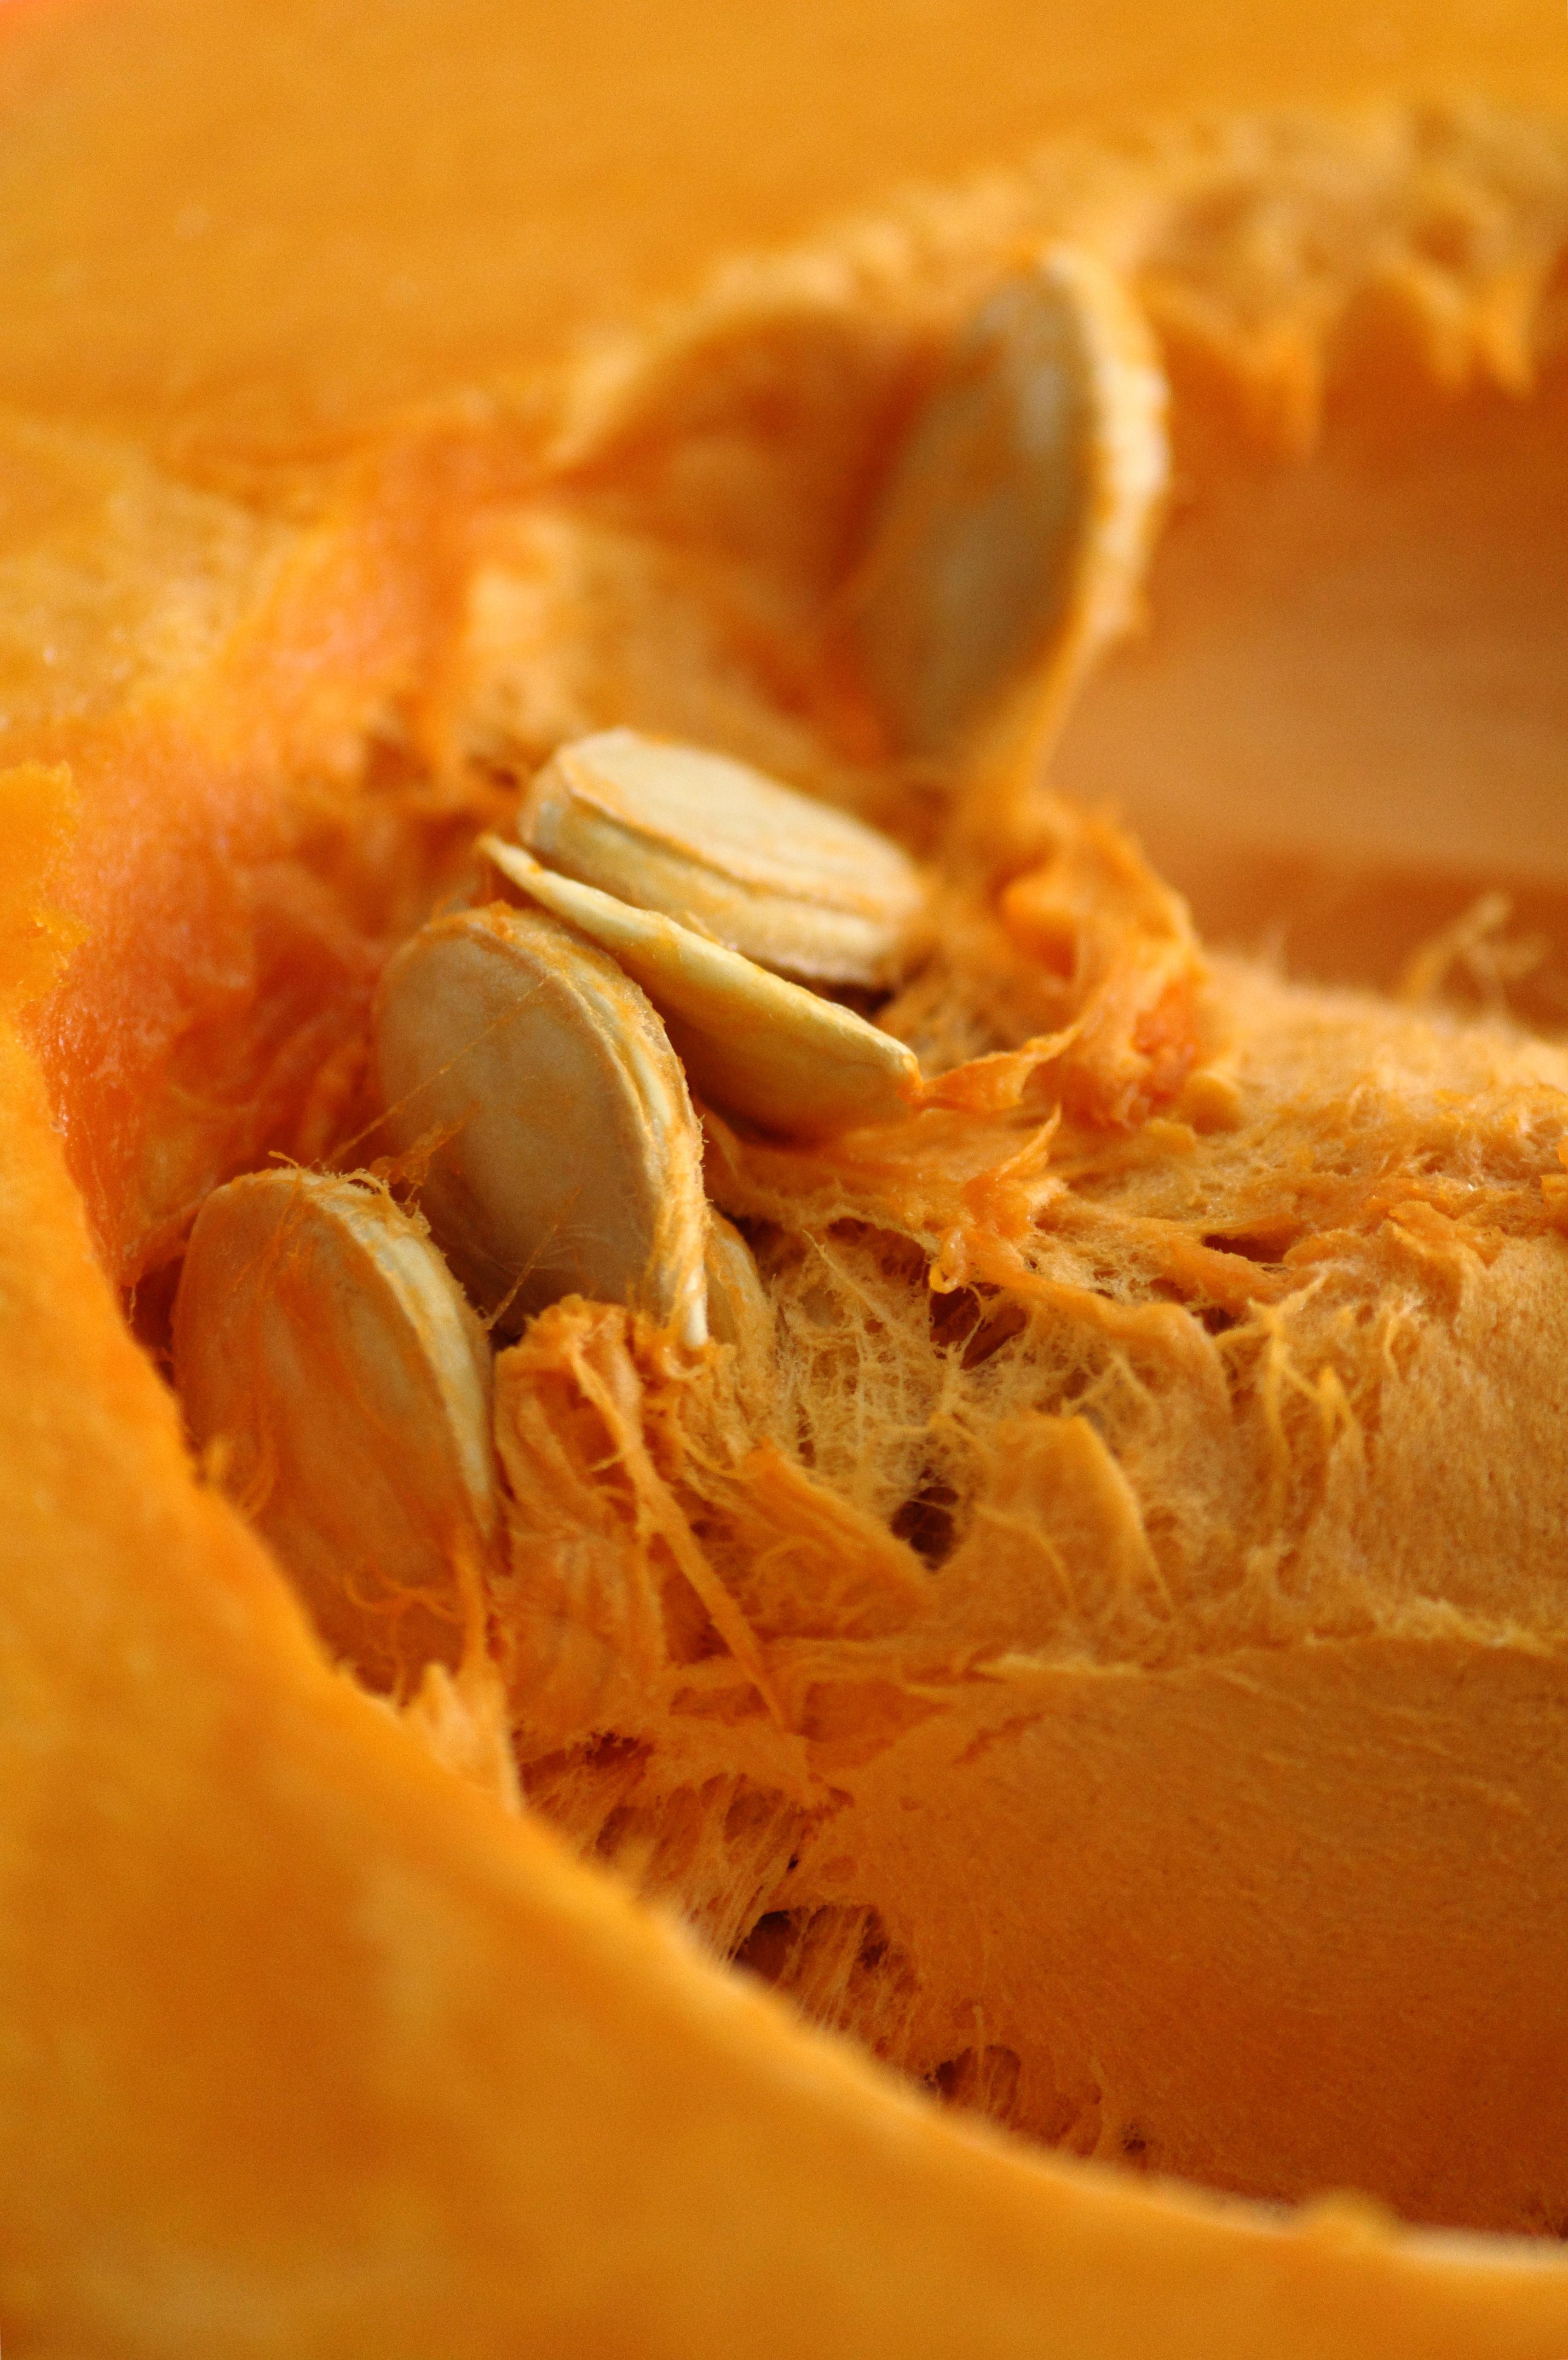 Pumpkin Pie Recipe With Real Pumpkin  Pumpkin Pie Recipe Using Real Pumpkin Women s Suite